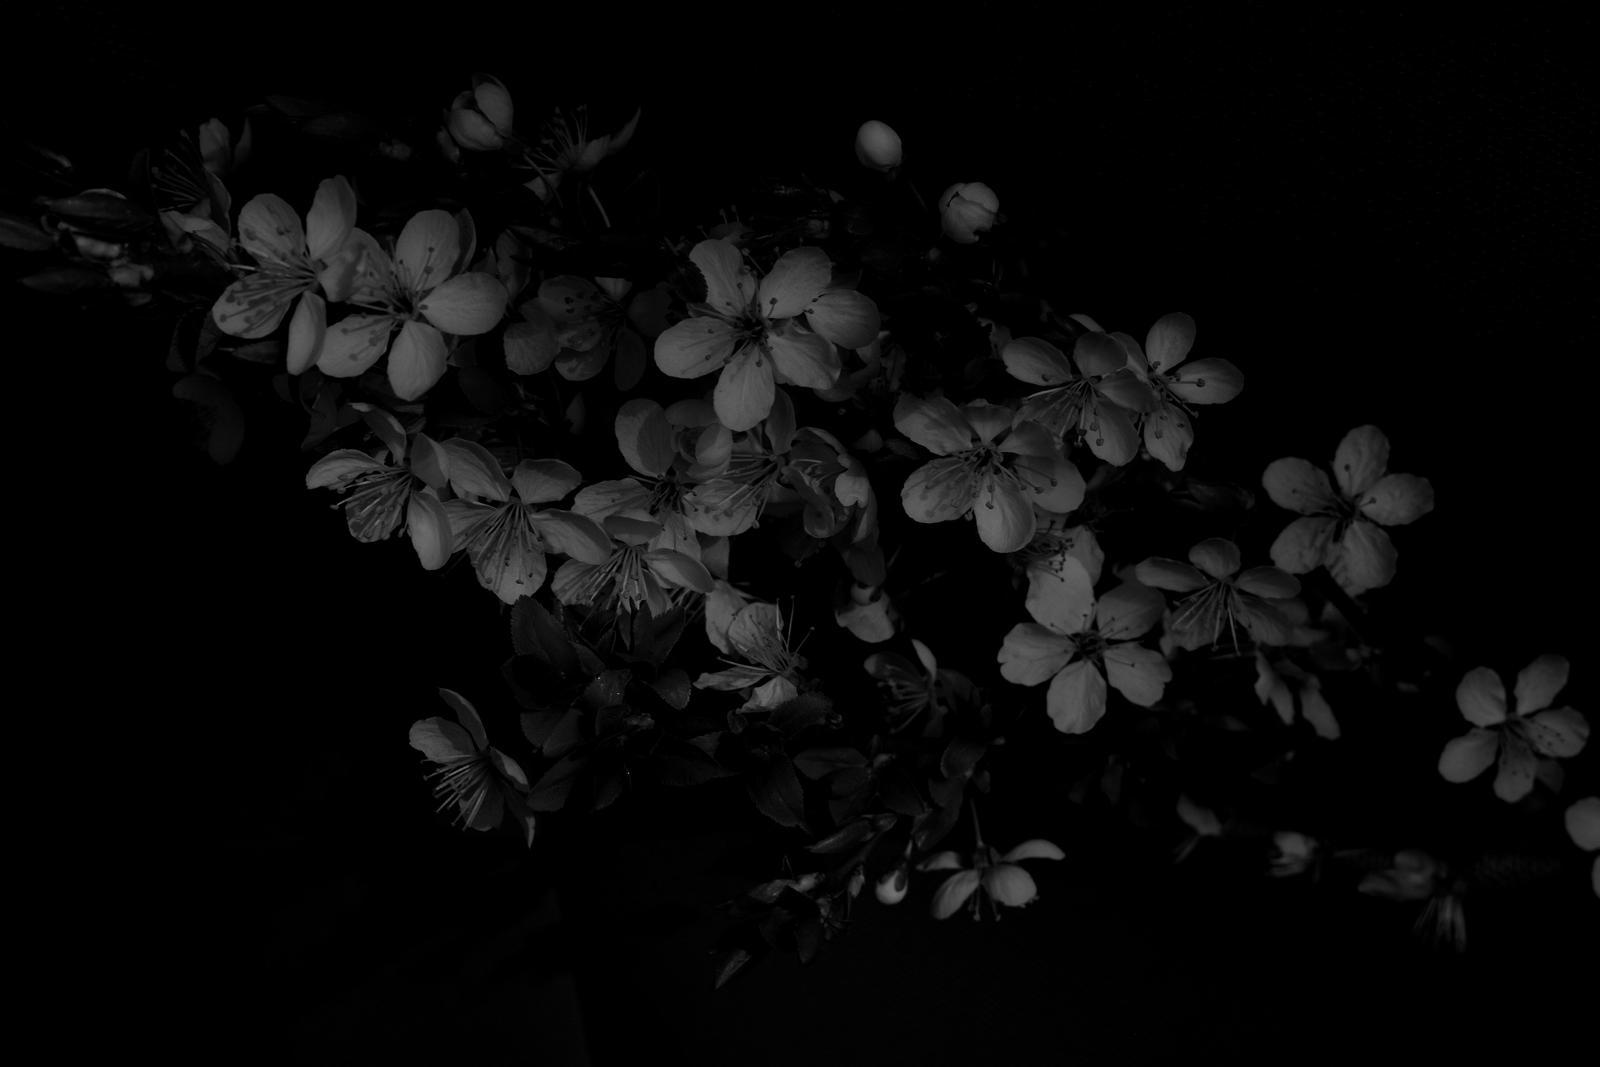 silence by TihanaV